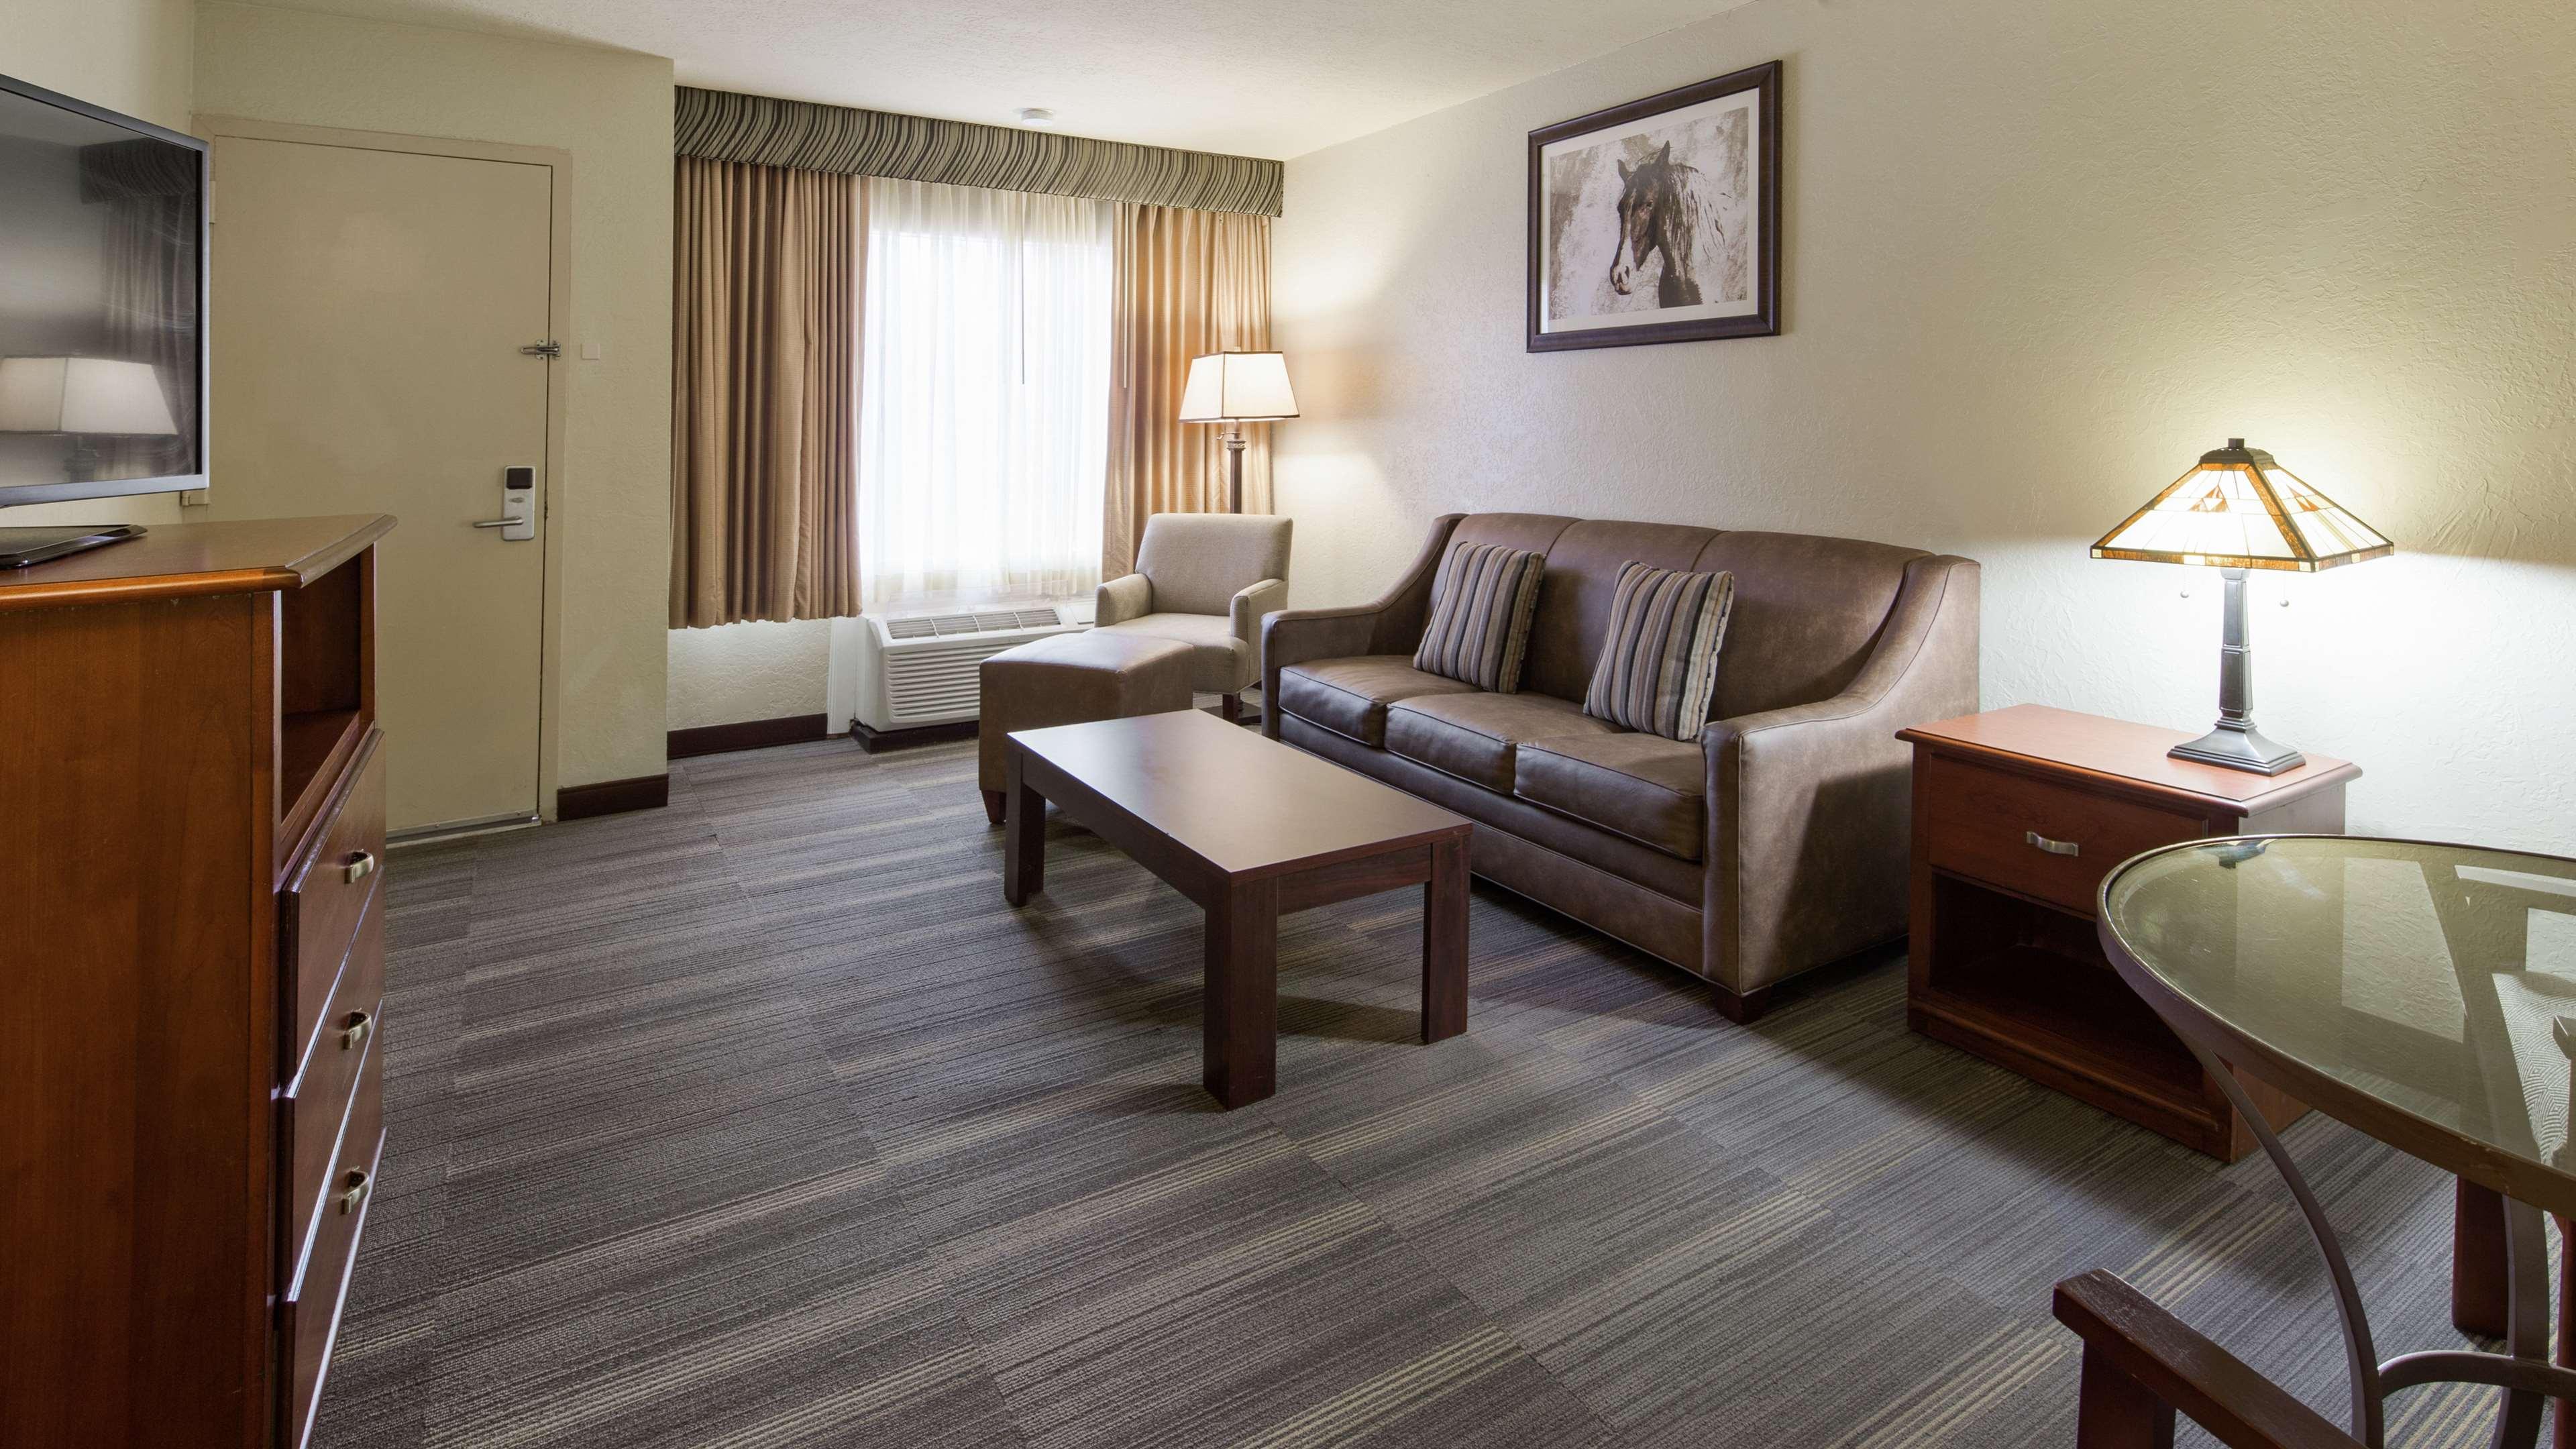 Best Western Plus Lawton Hotel & Convention Center image 15